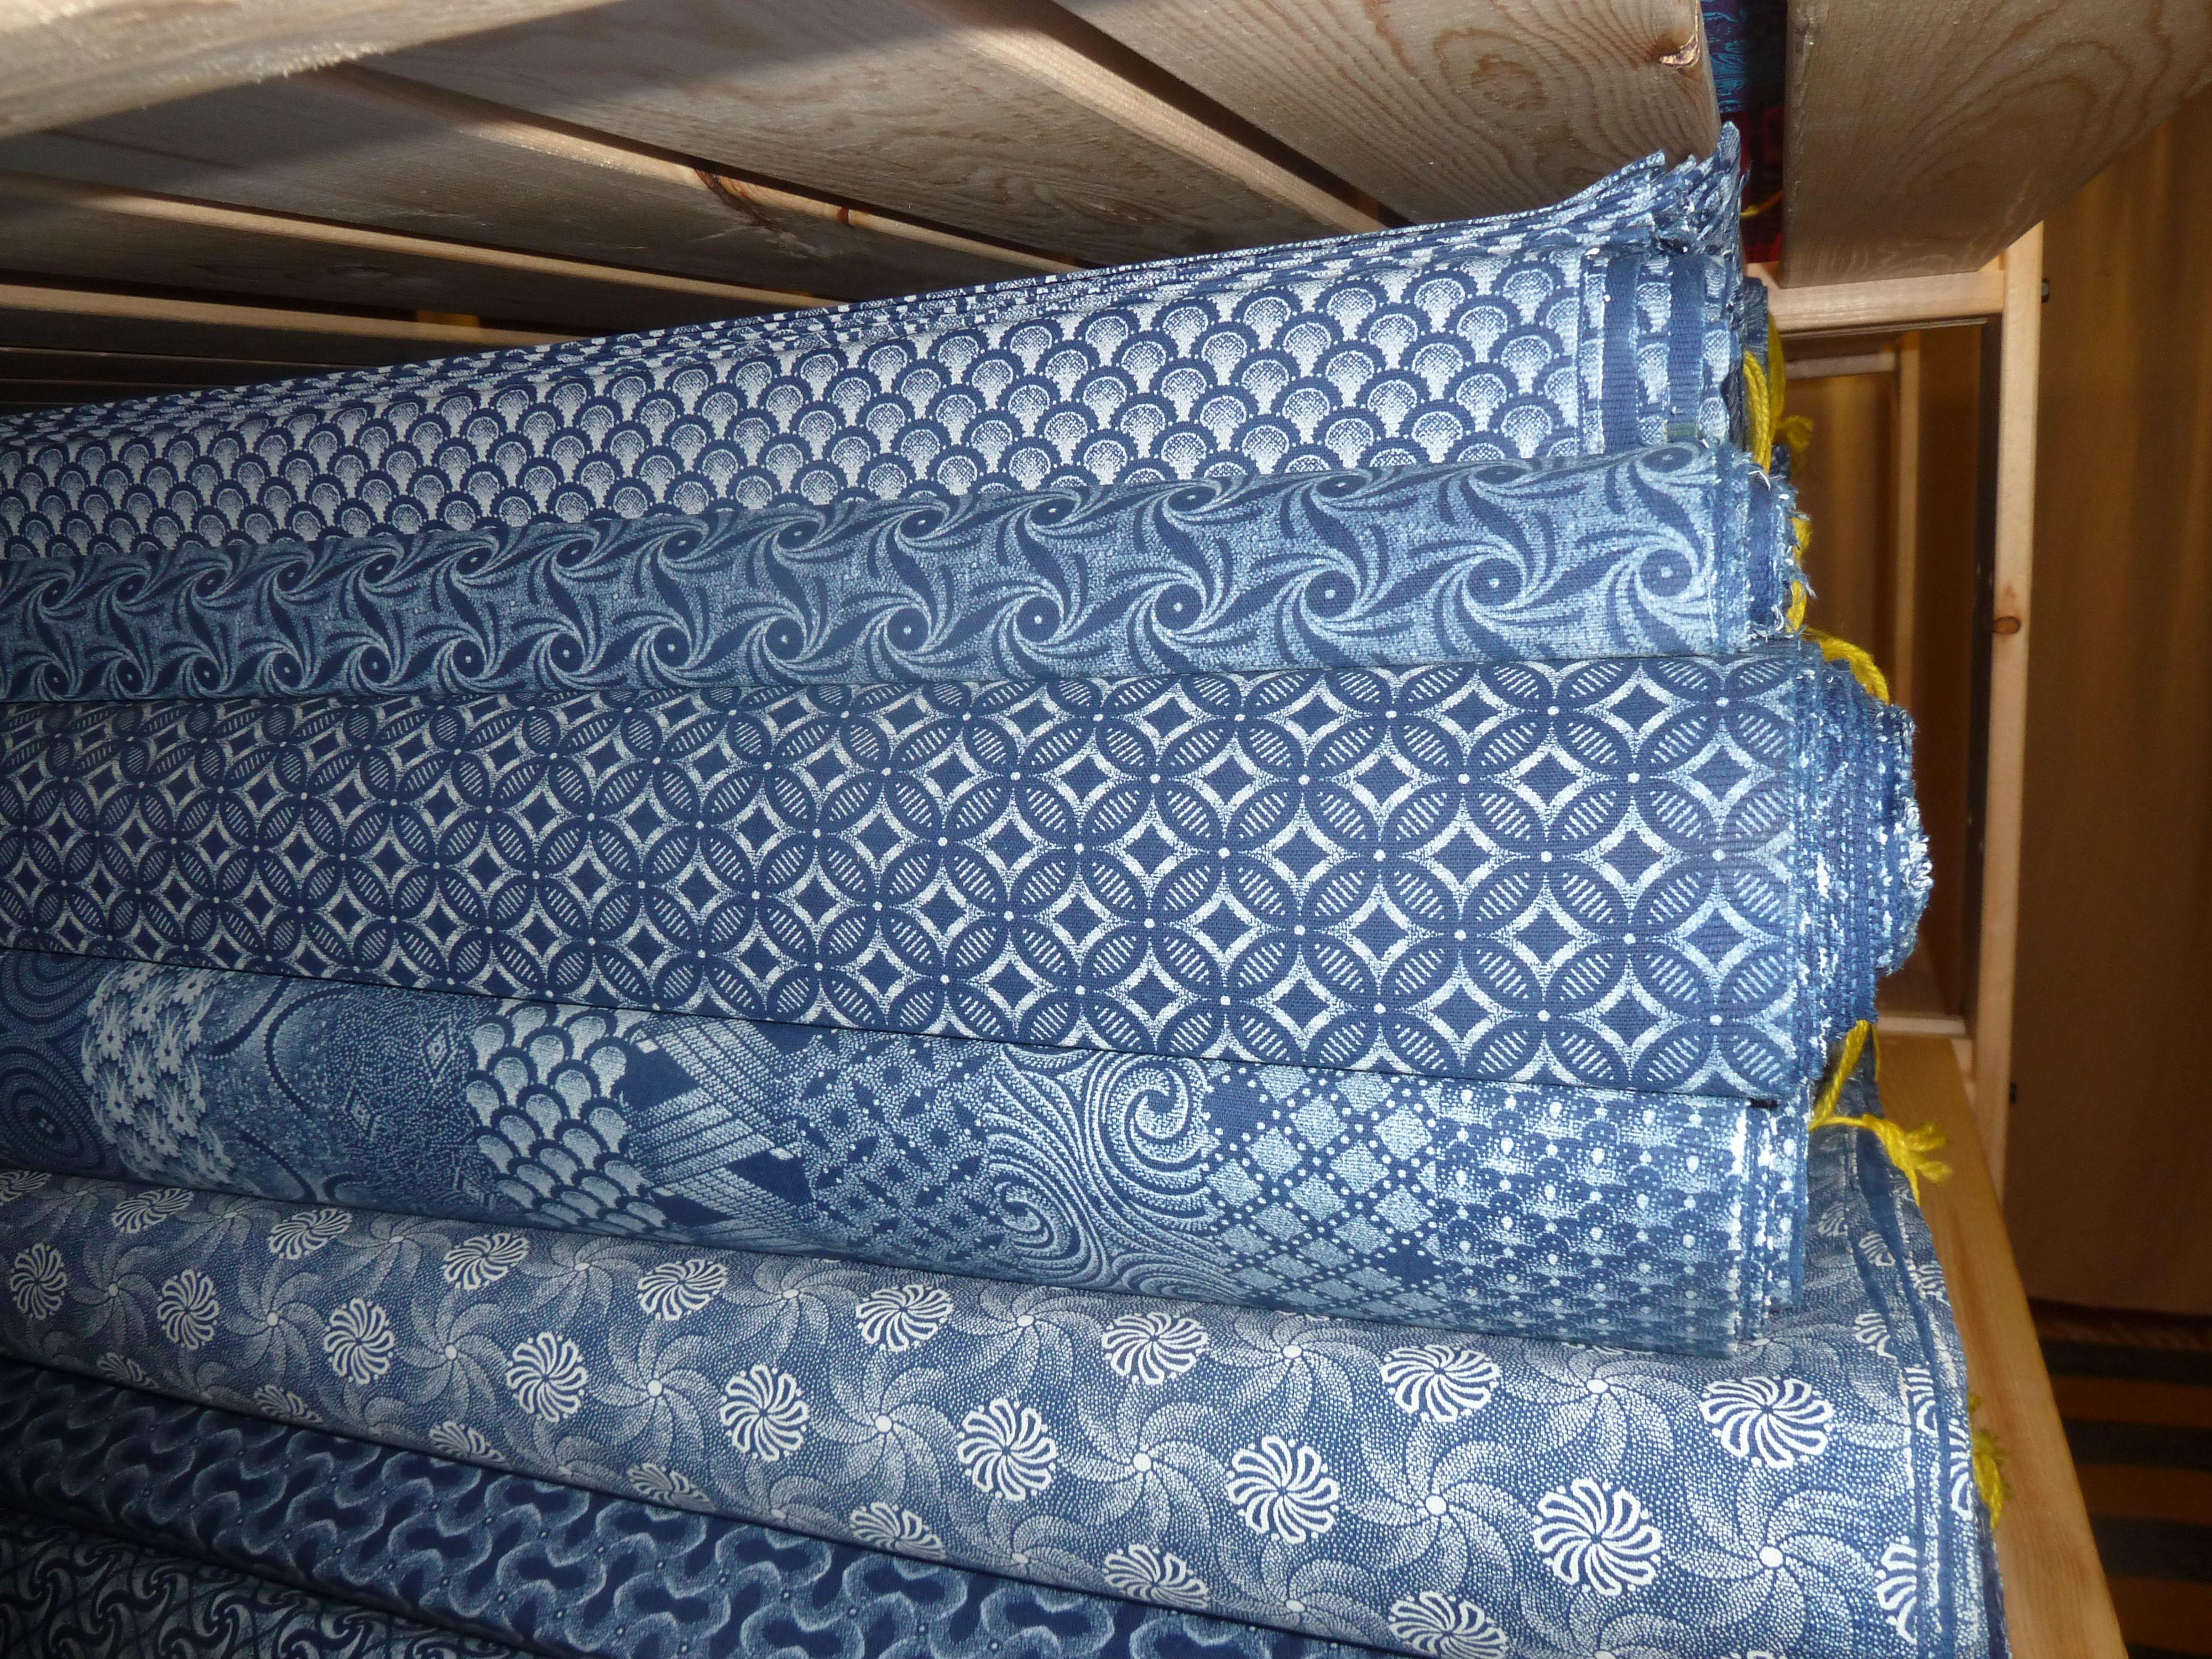 Wholesale Orders Fabric stores online, Indigo textiles